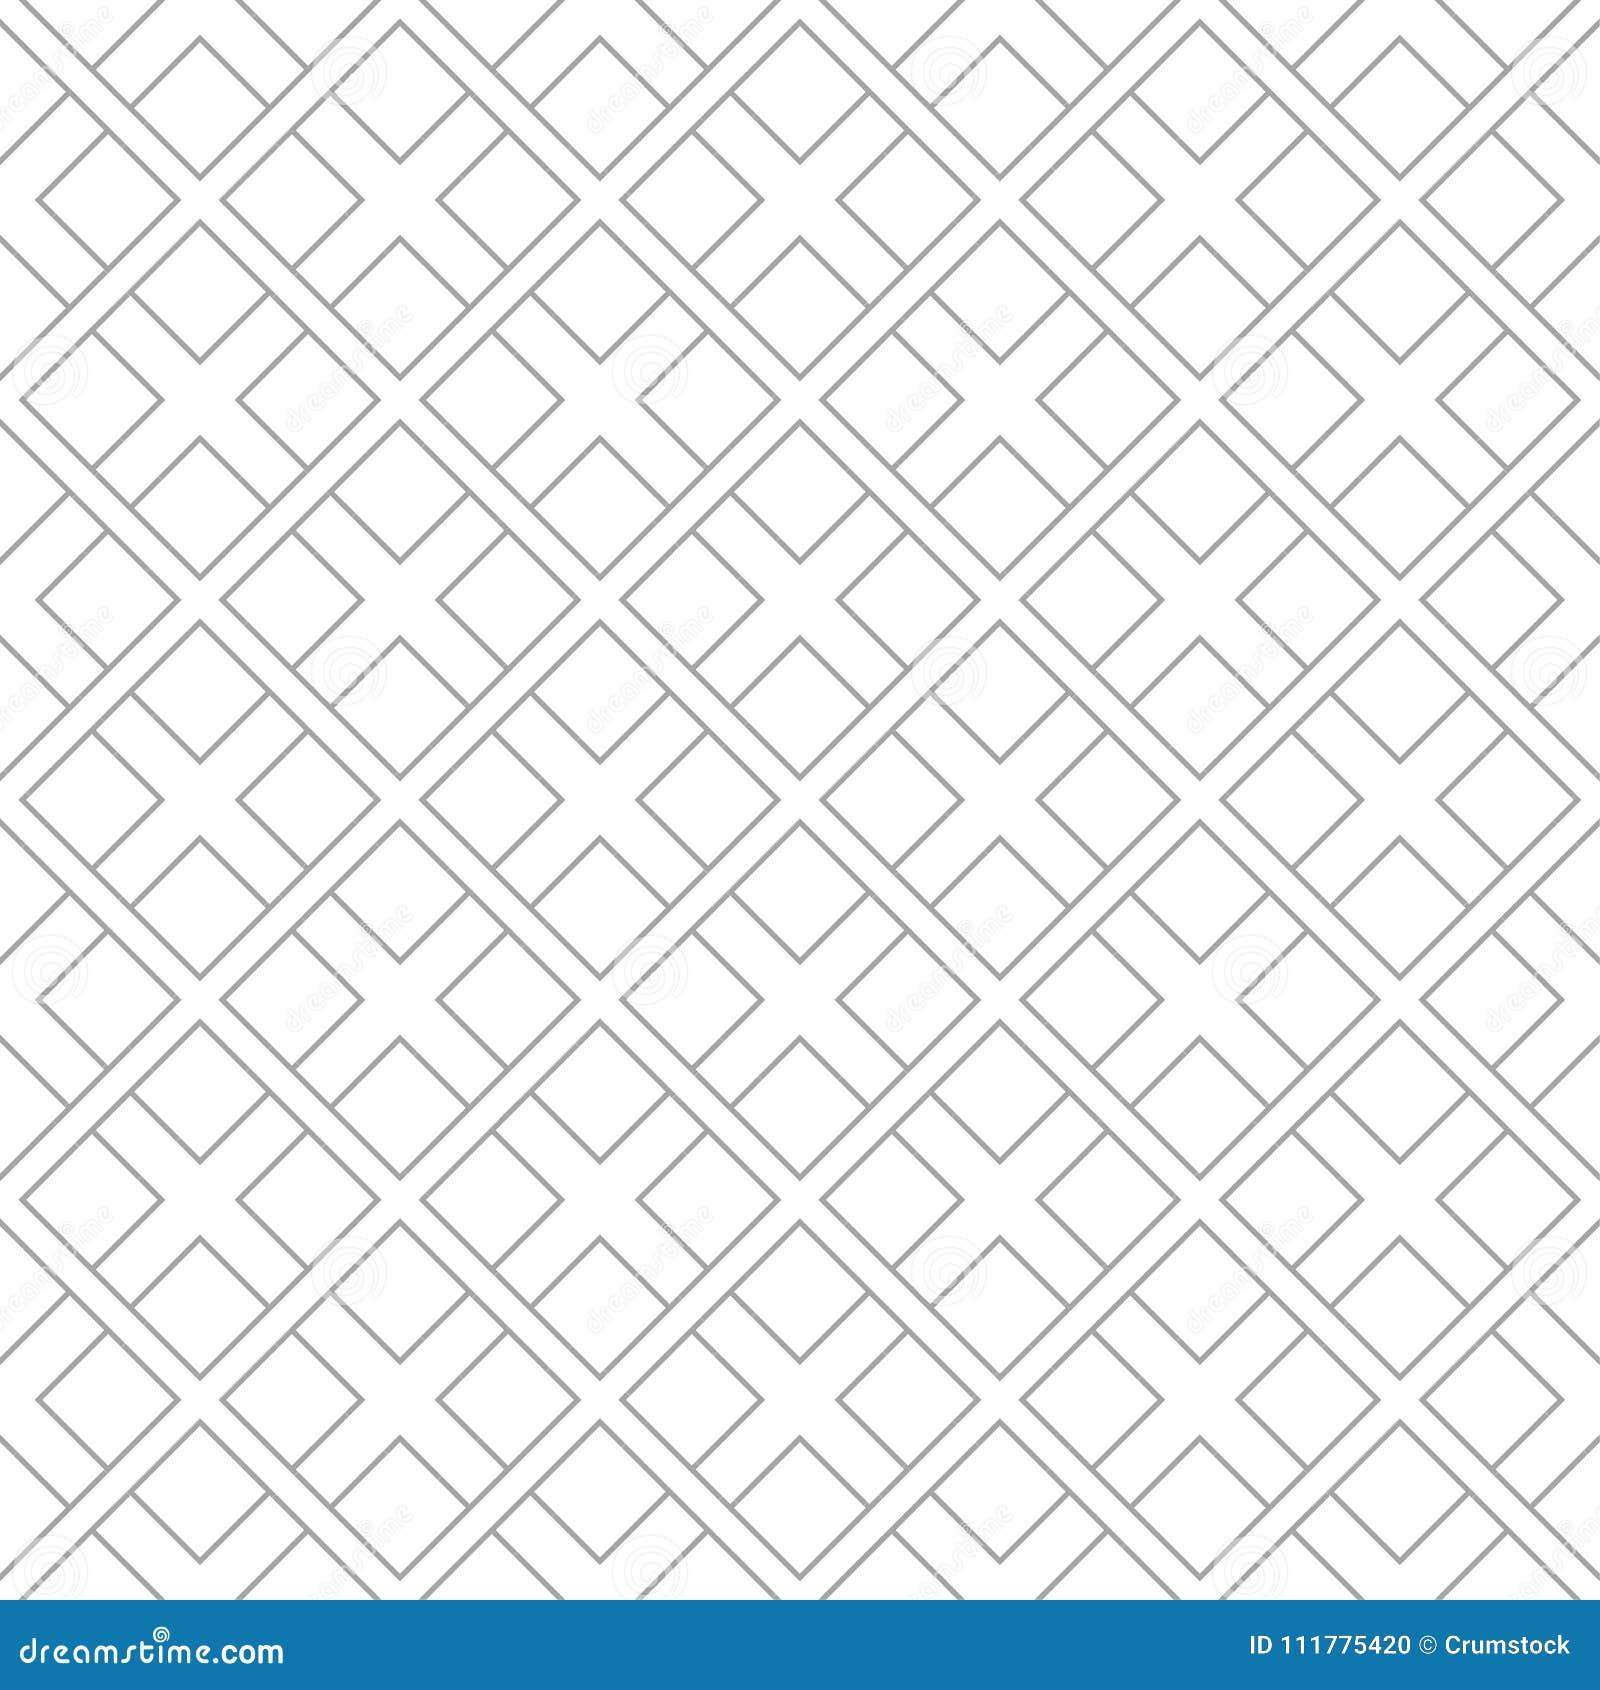 Gray geometric design on white background. Seamless pattern